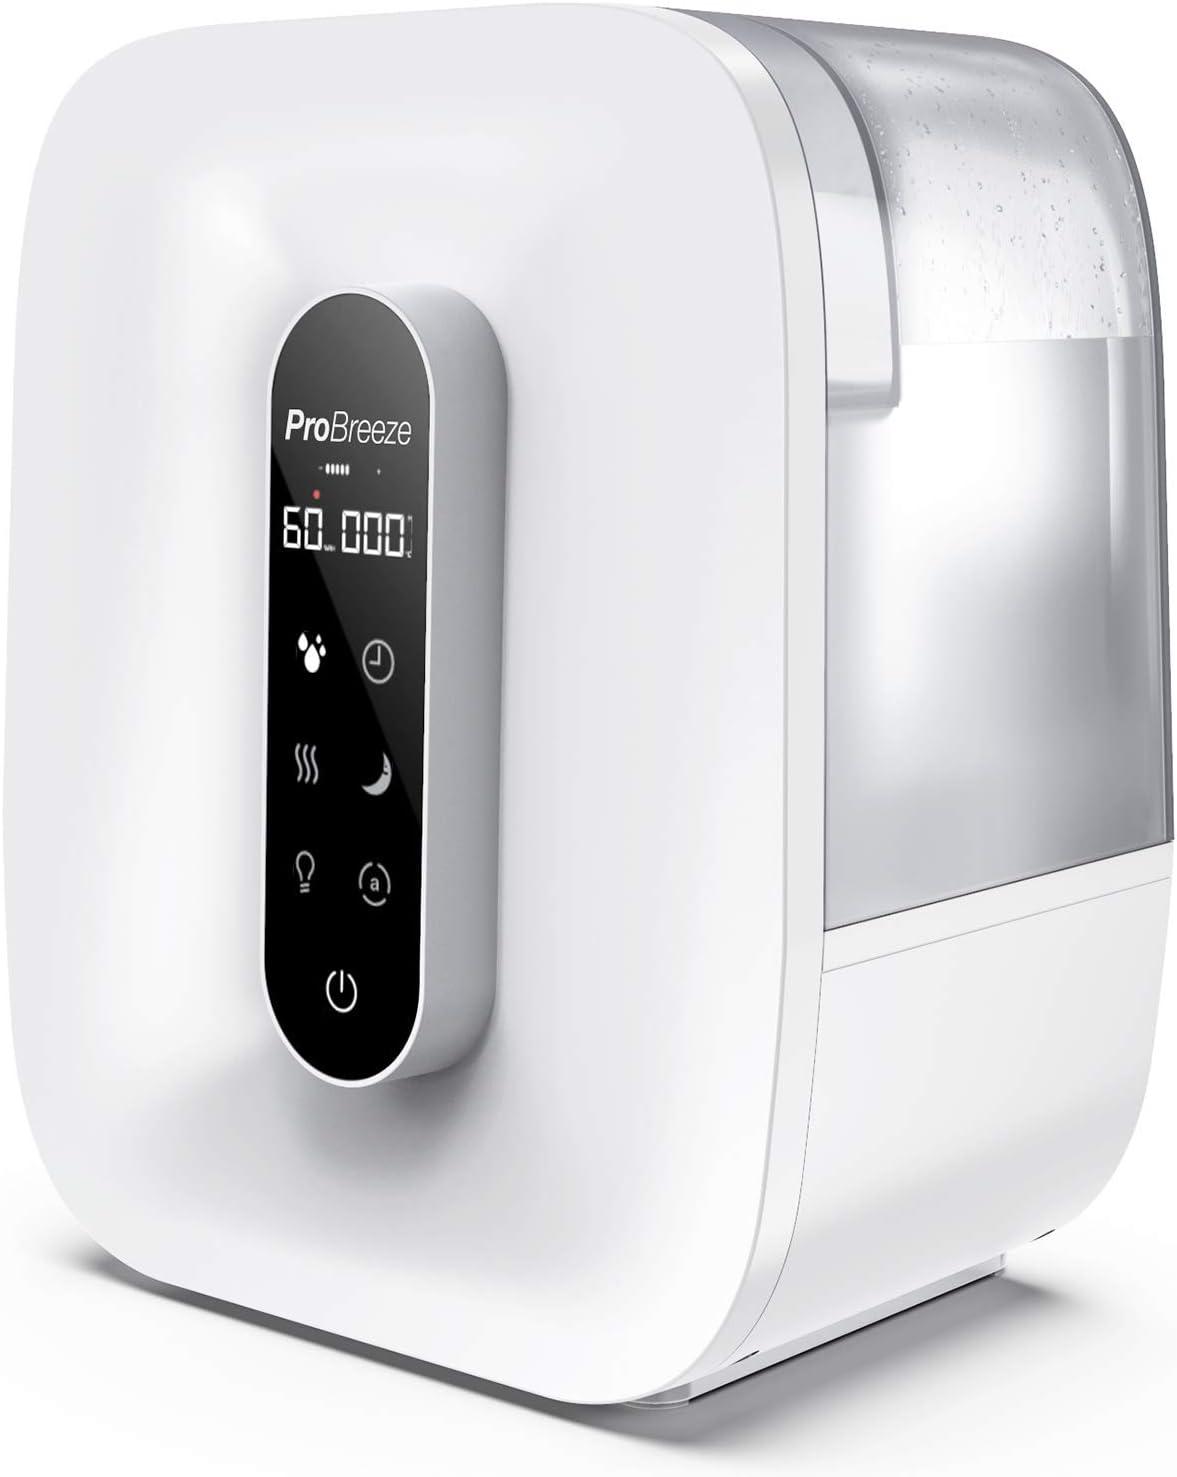 CVS Humidifier Review: Warm Moisture Humidifiers vs Cool Moisture